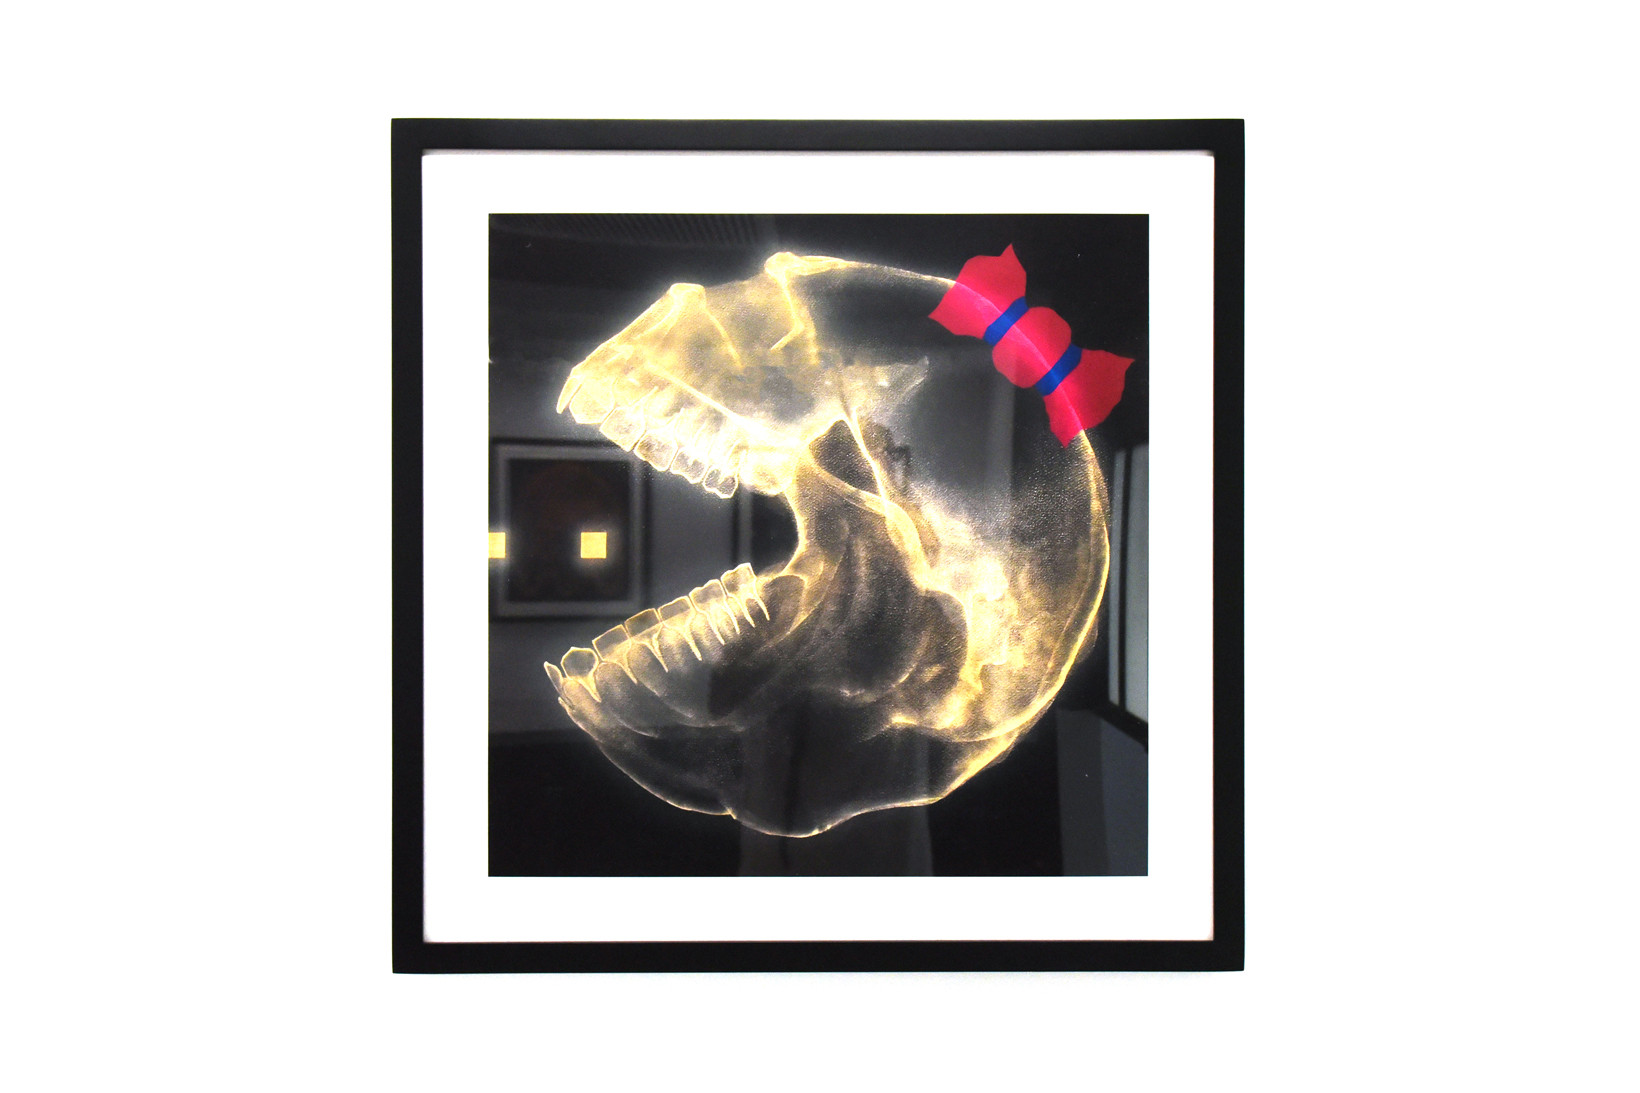 Shok 1 Xs Daniel Arsham Ronnie Fieg Gallery Exhibition Kith Soho New York  City Artworks Art